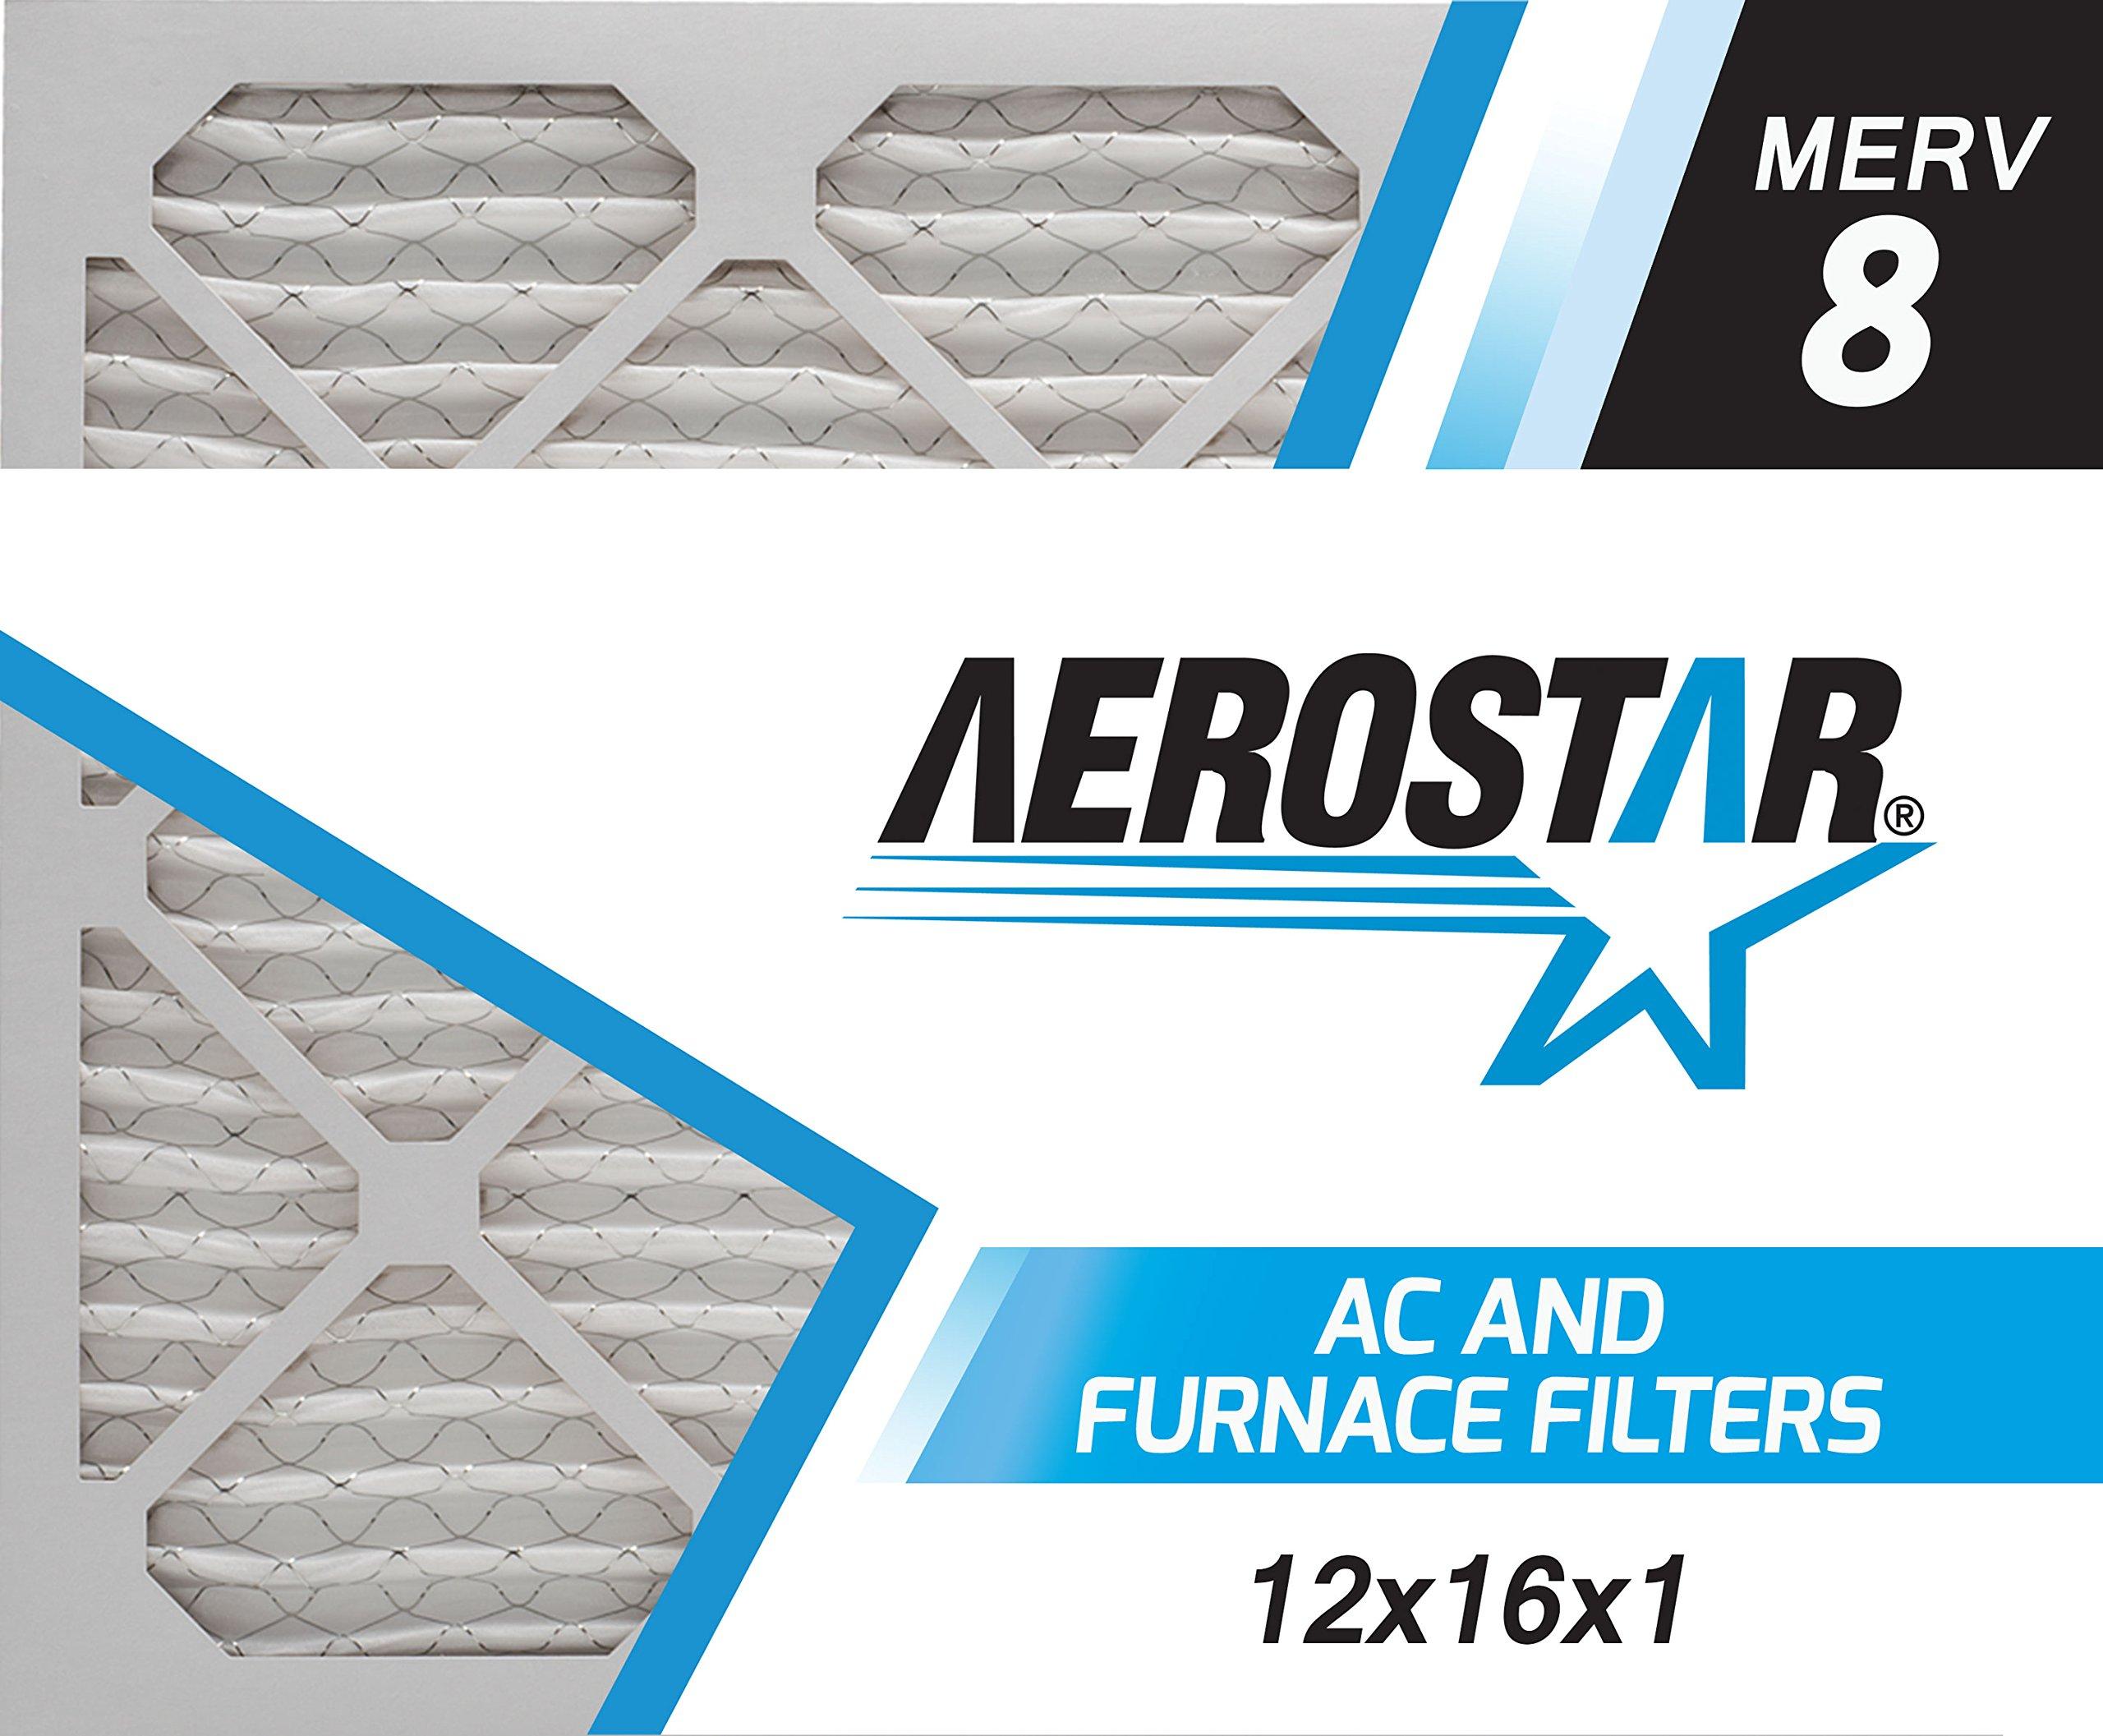 12x16x1 AC and Furnace Air Filter by Aerostar - MERV 8, Box of 12